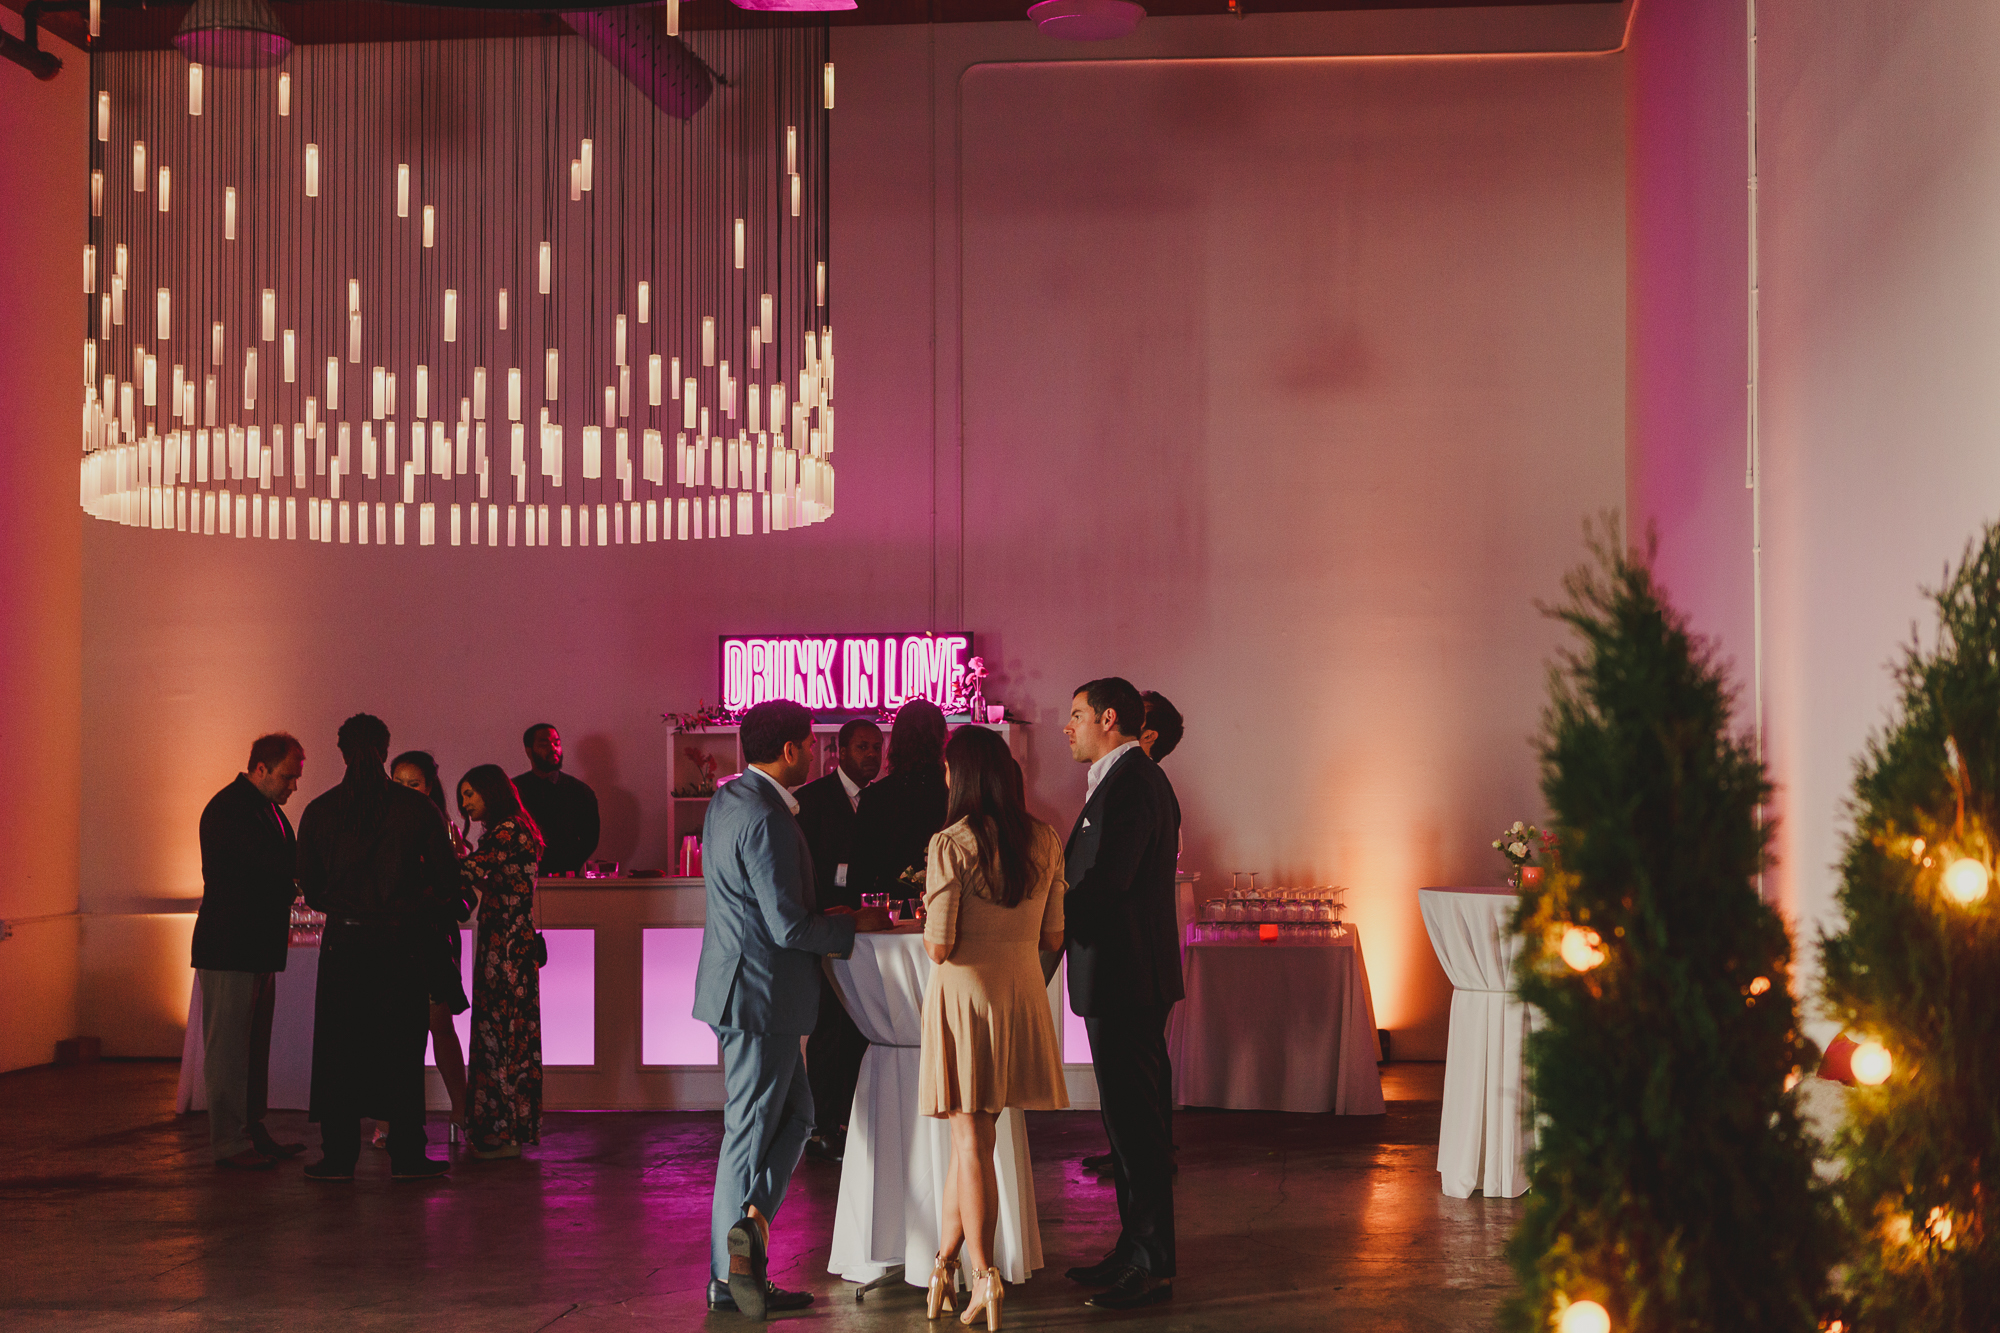 canvas event space wedding photos by Krista Welch-0063.jpg